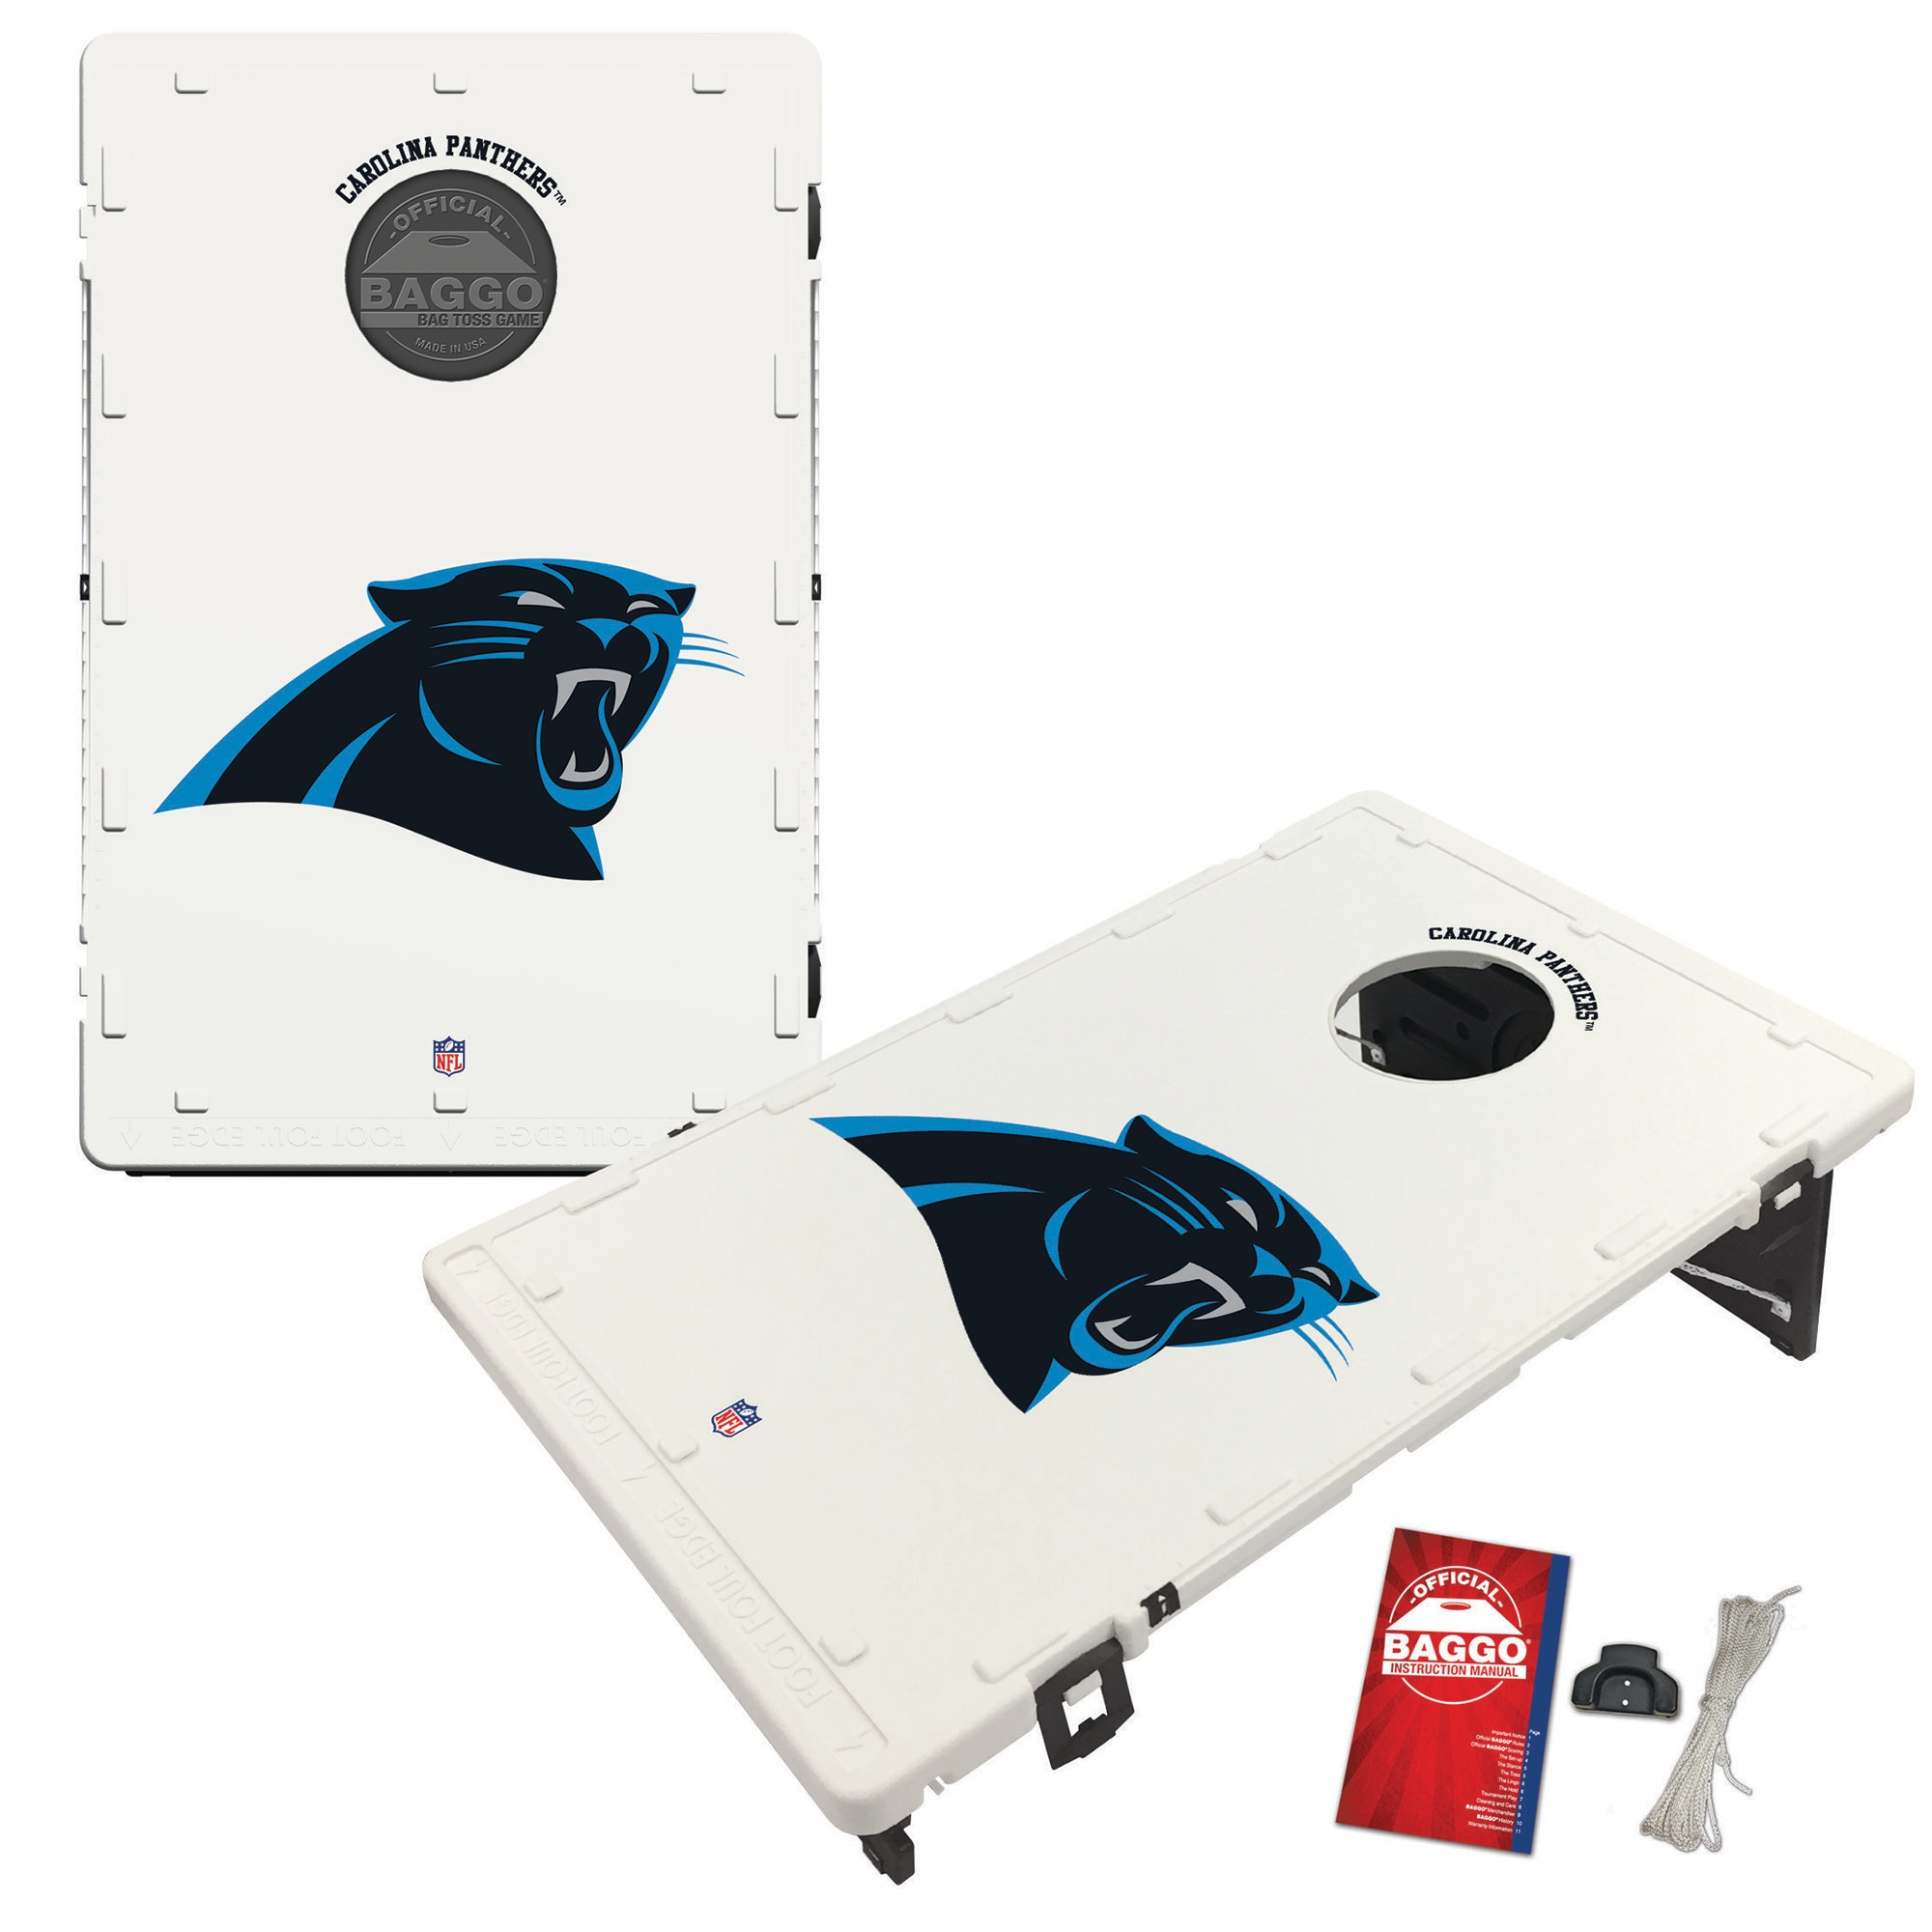 Carolina Panthers 2' x 3' Classic Design BAGGO Cornhole Board Tailgate Toss Set